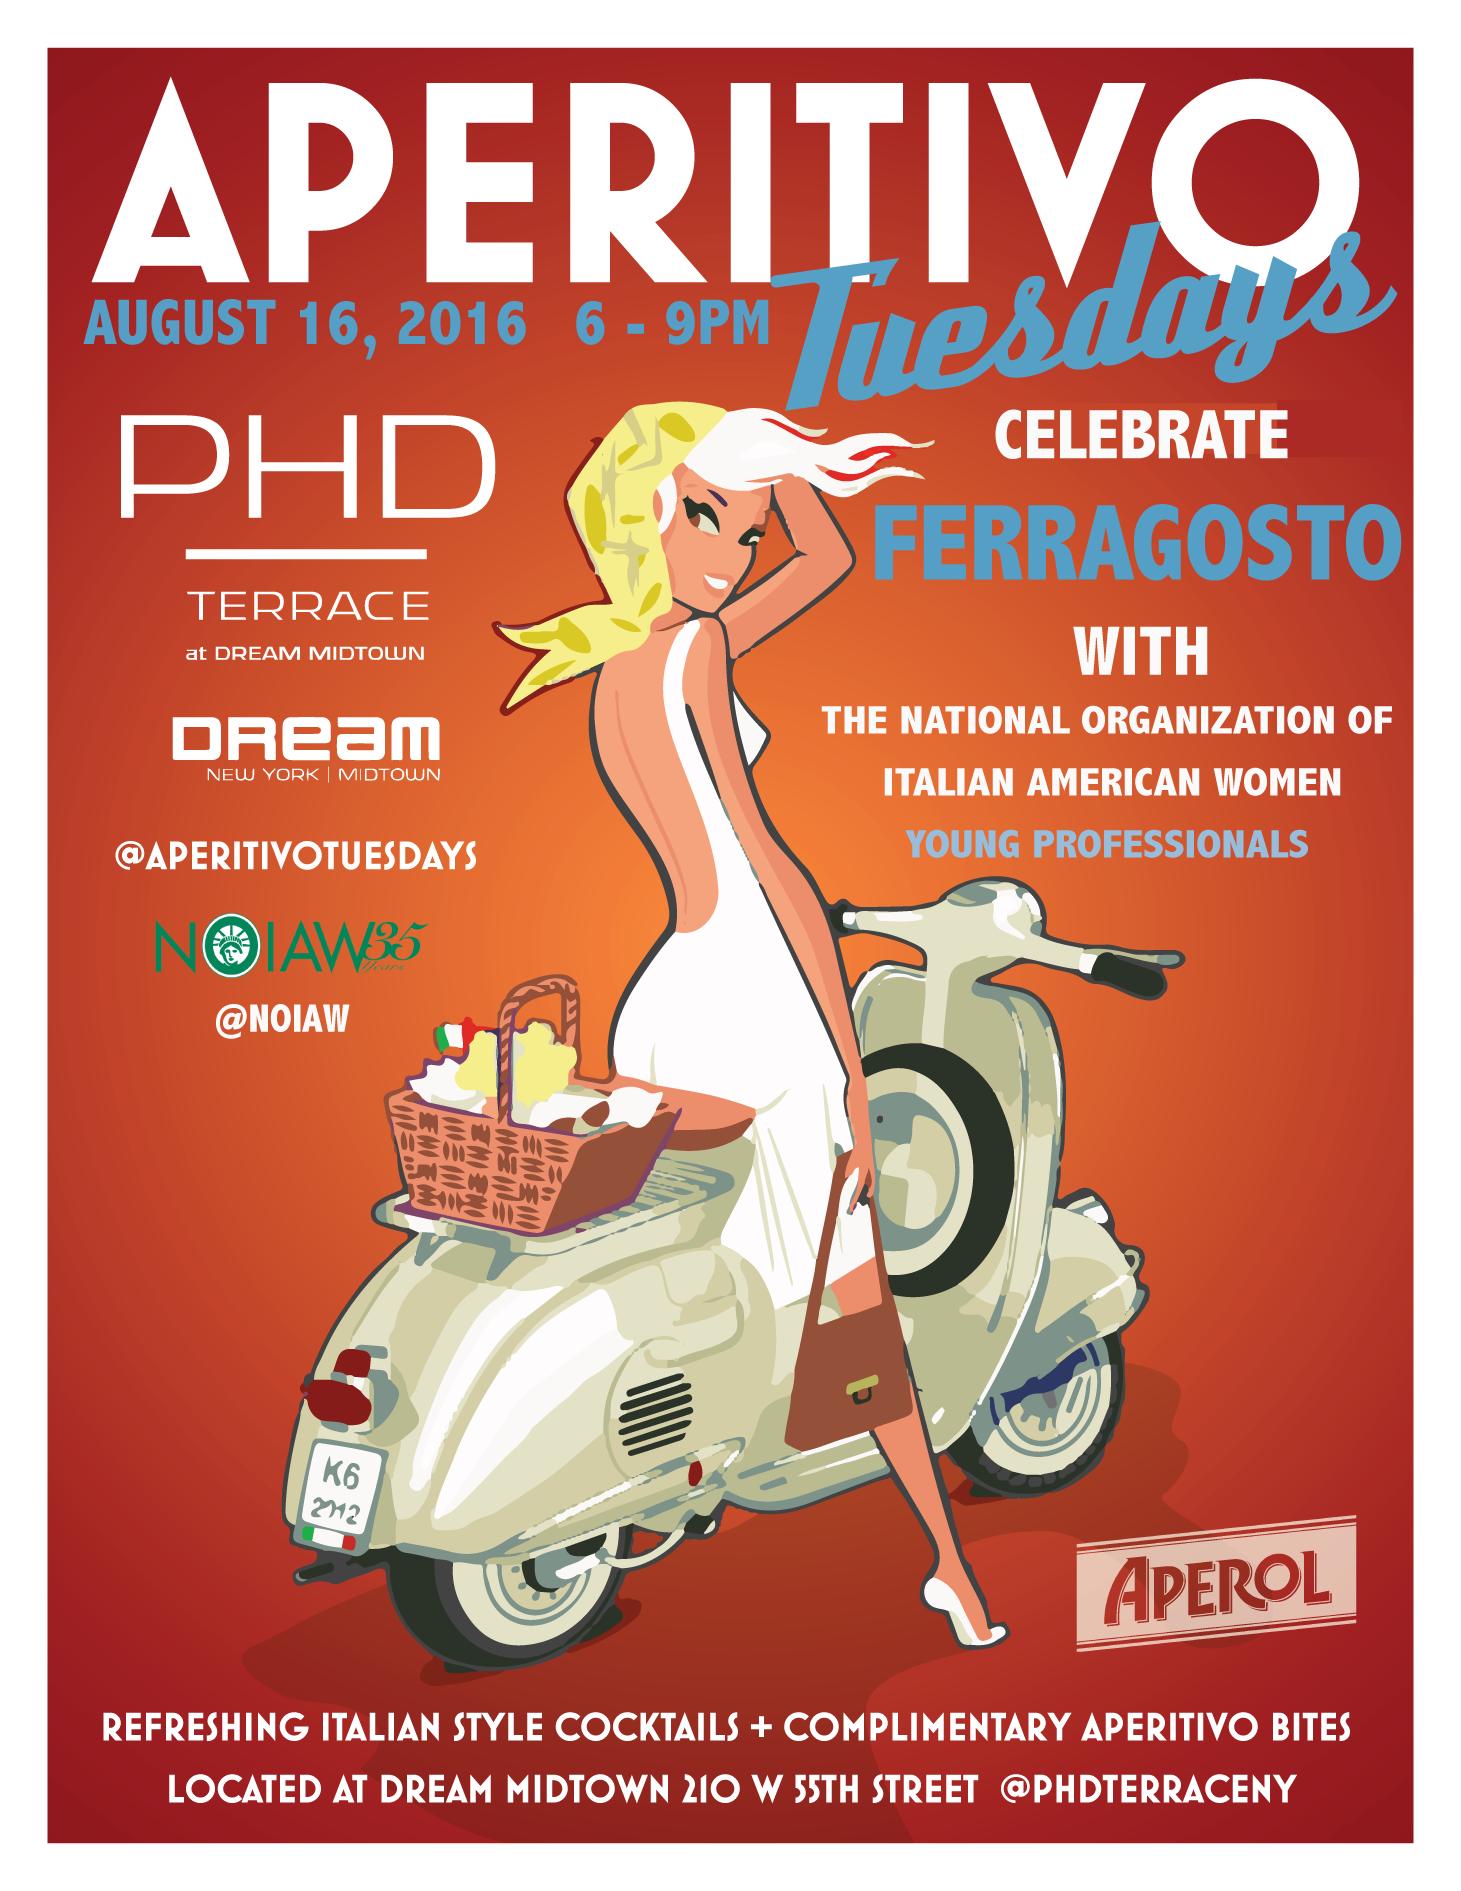 Ferragosto-Graphic-Updated